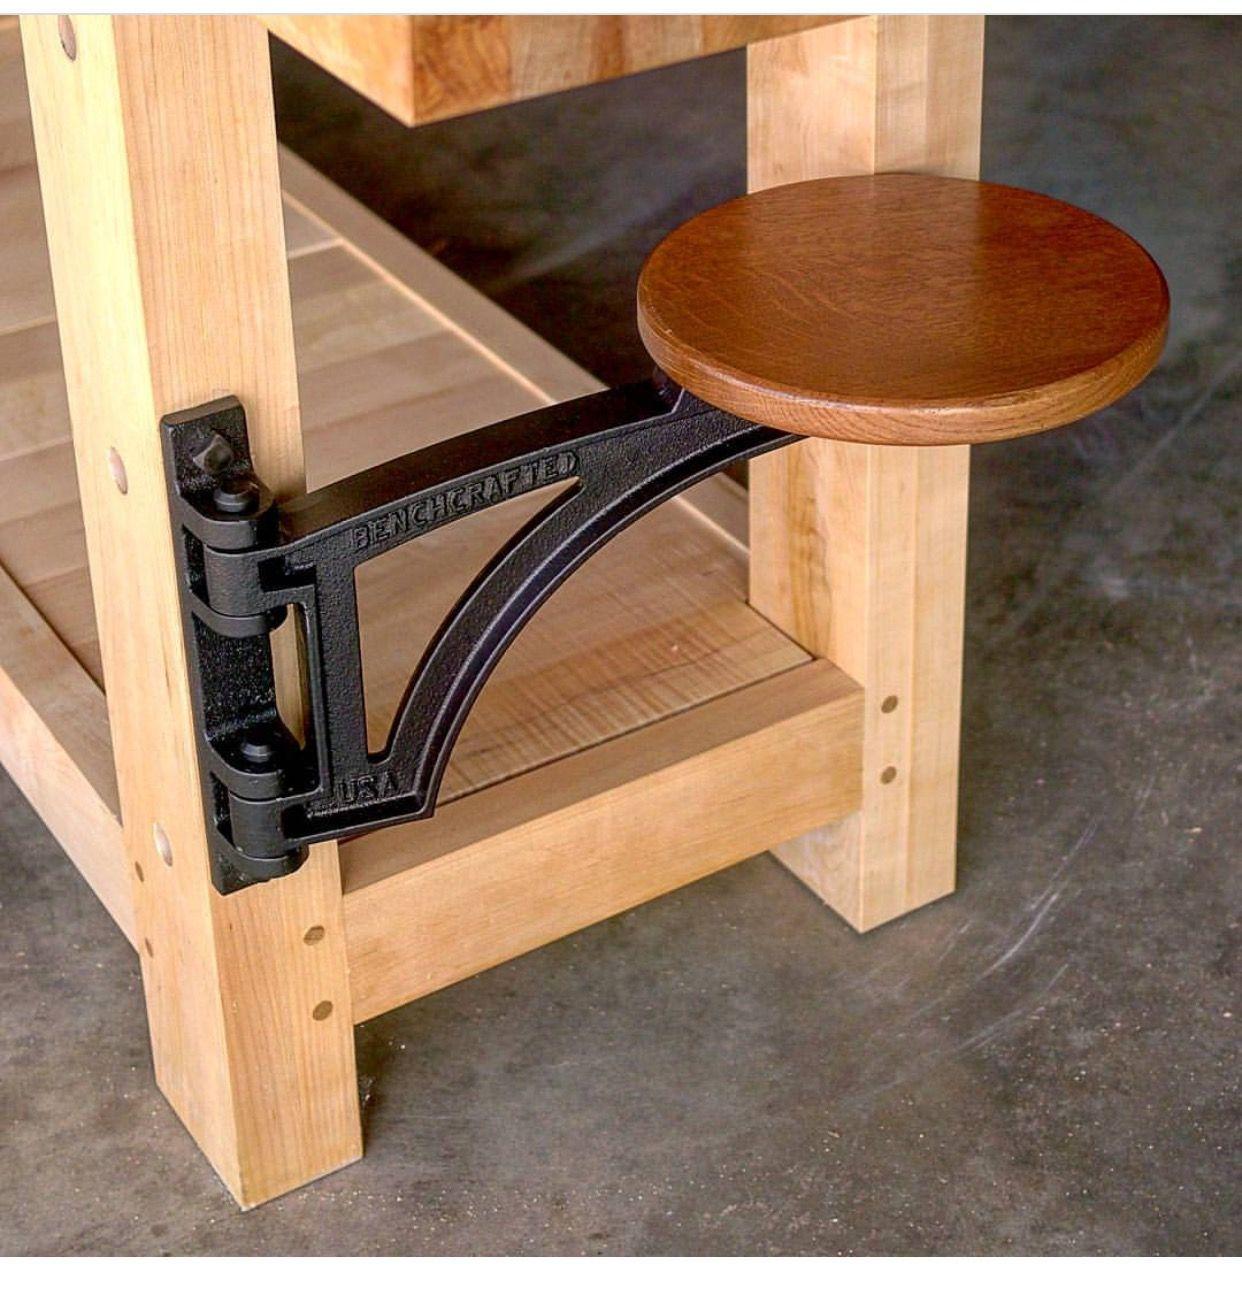 16 Awe Inspiring Wood Working Bench Decks Ideas With Images Woodworking Furniture Woodworking Furniture Plans Woodworking Table